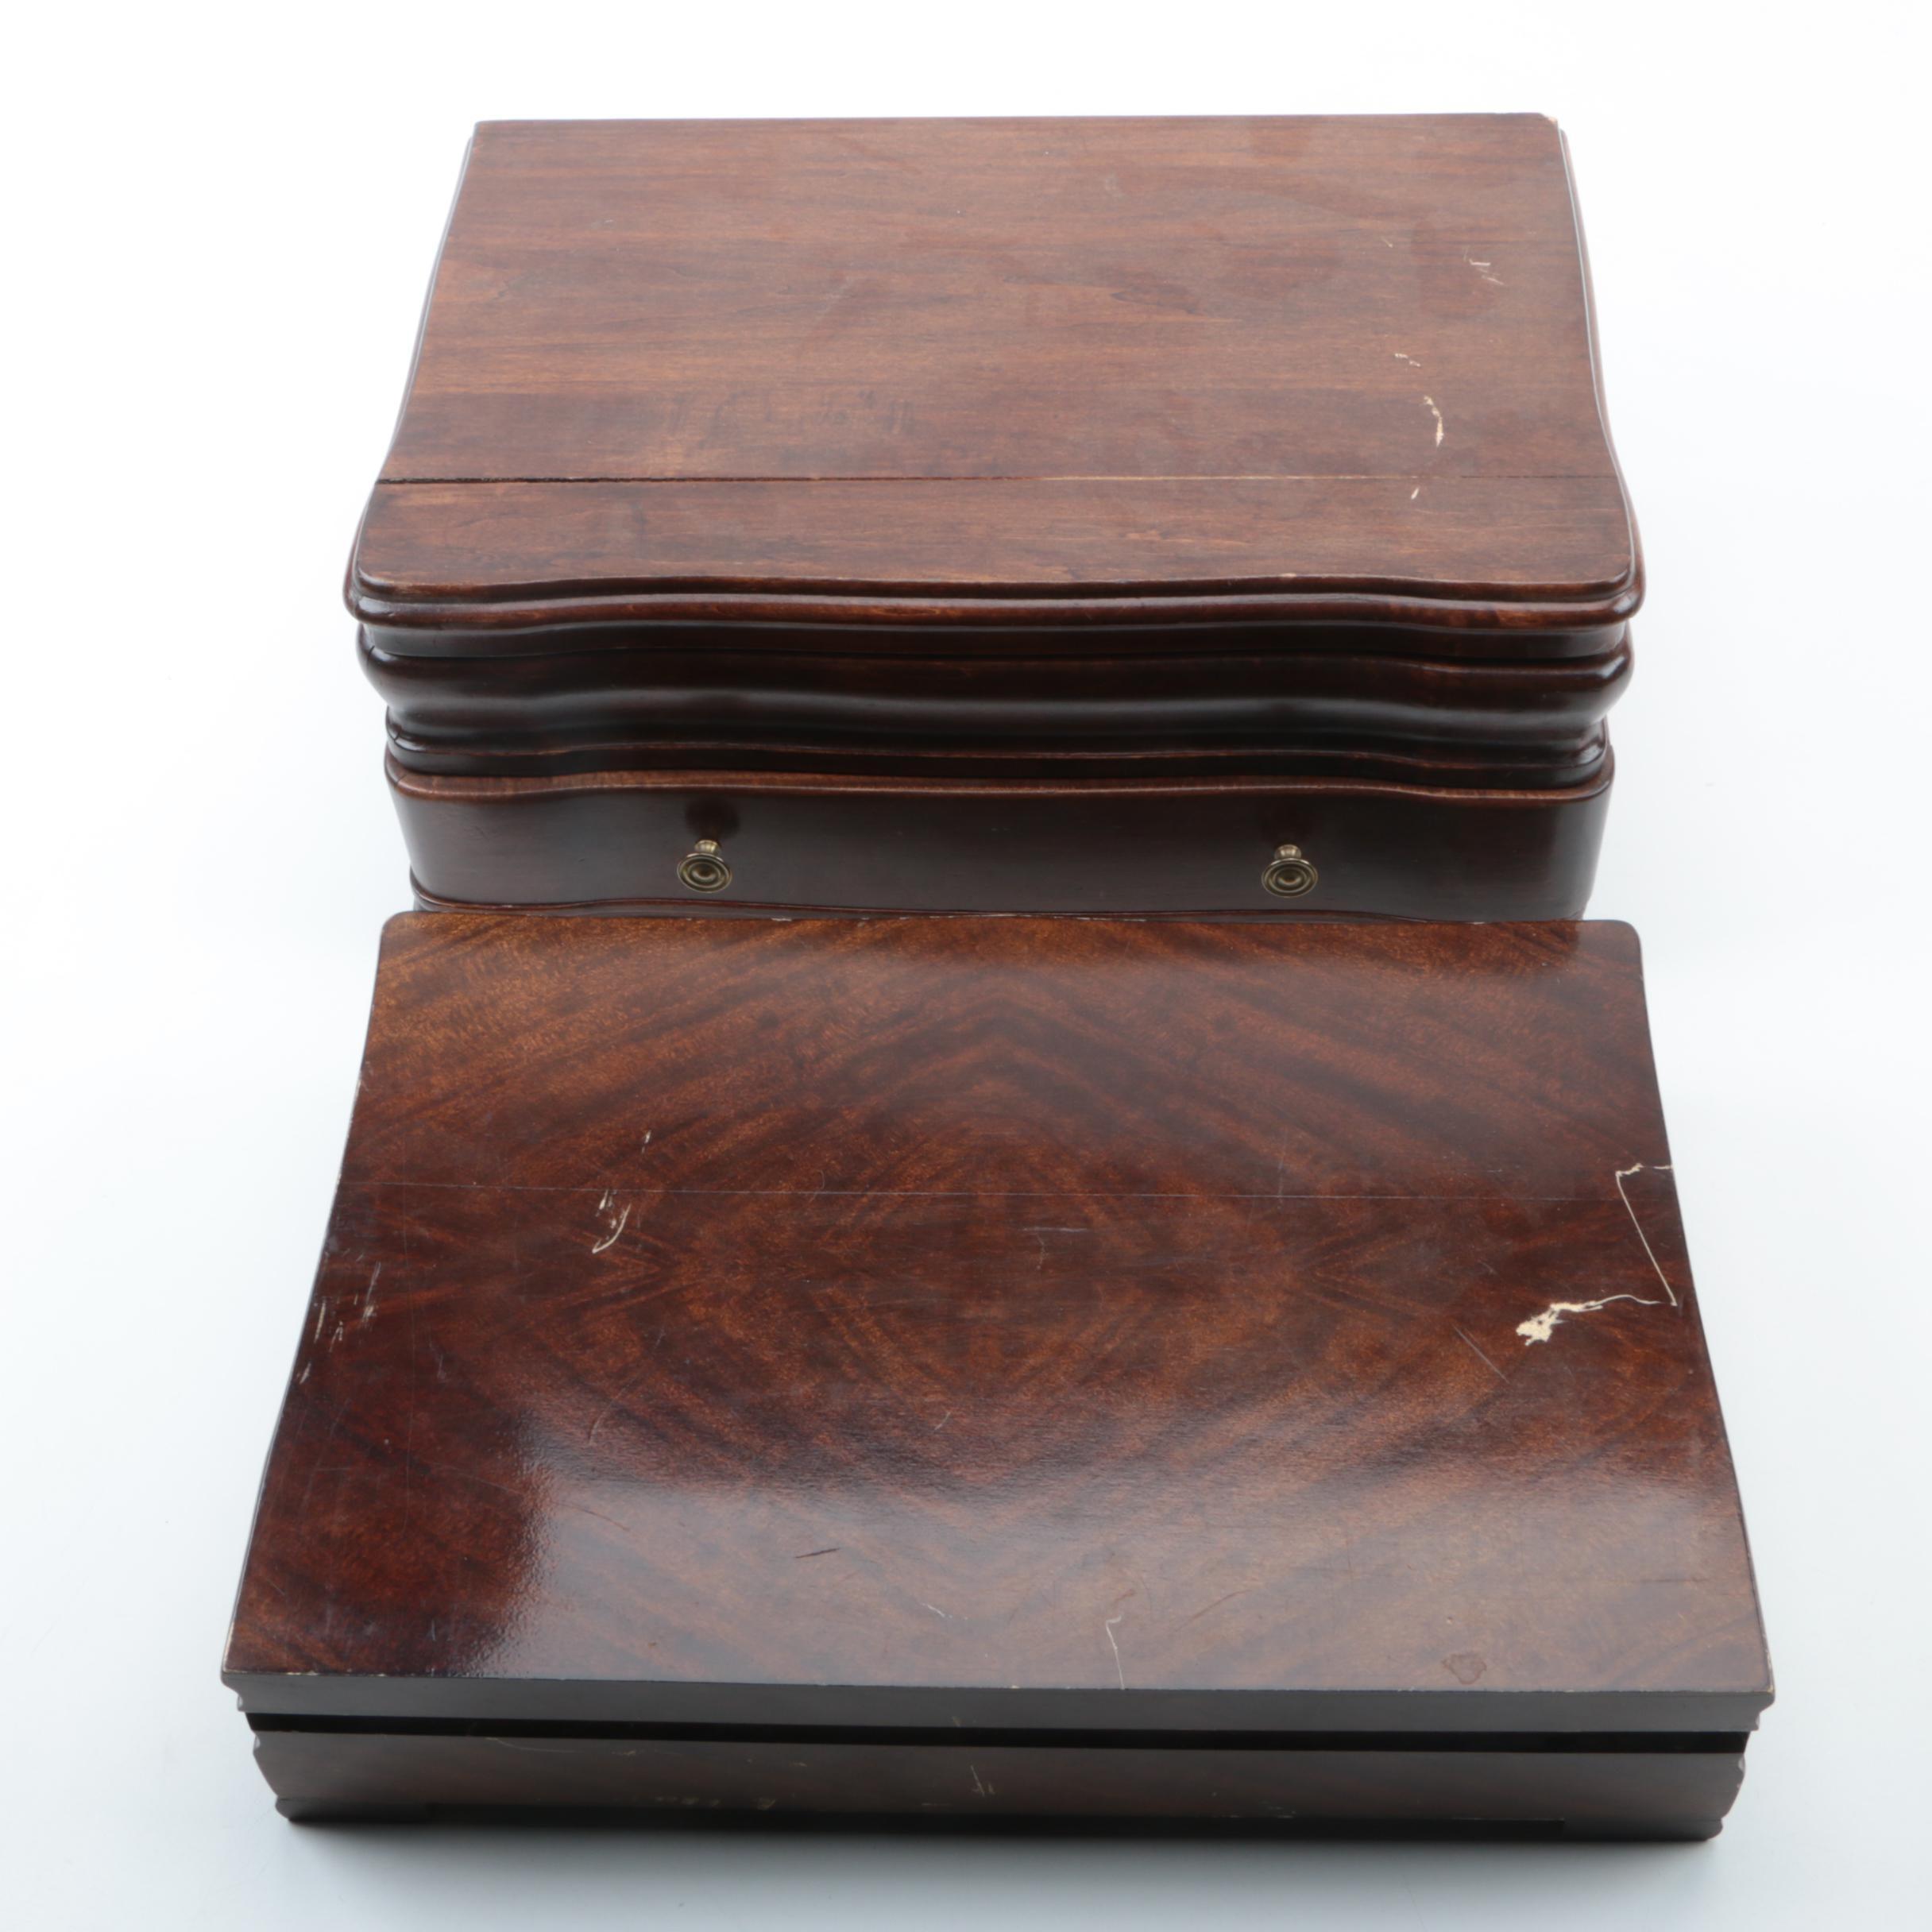 Wooden Flatware Chests